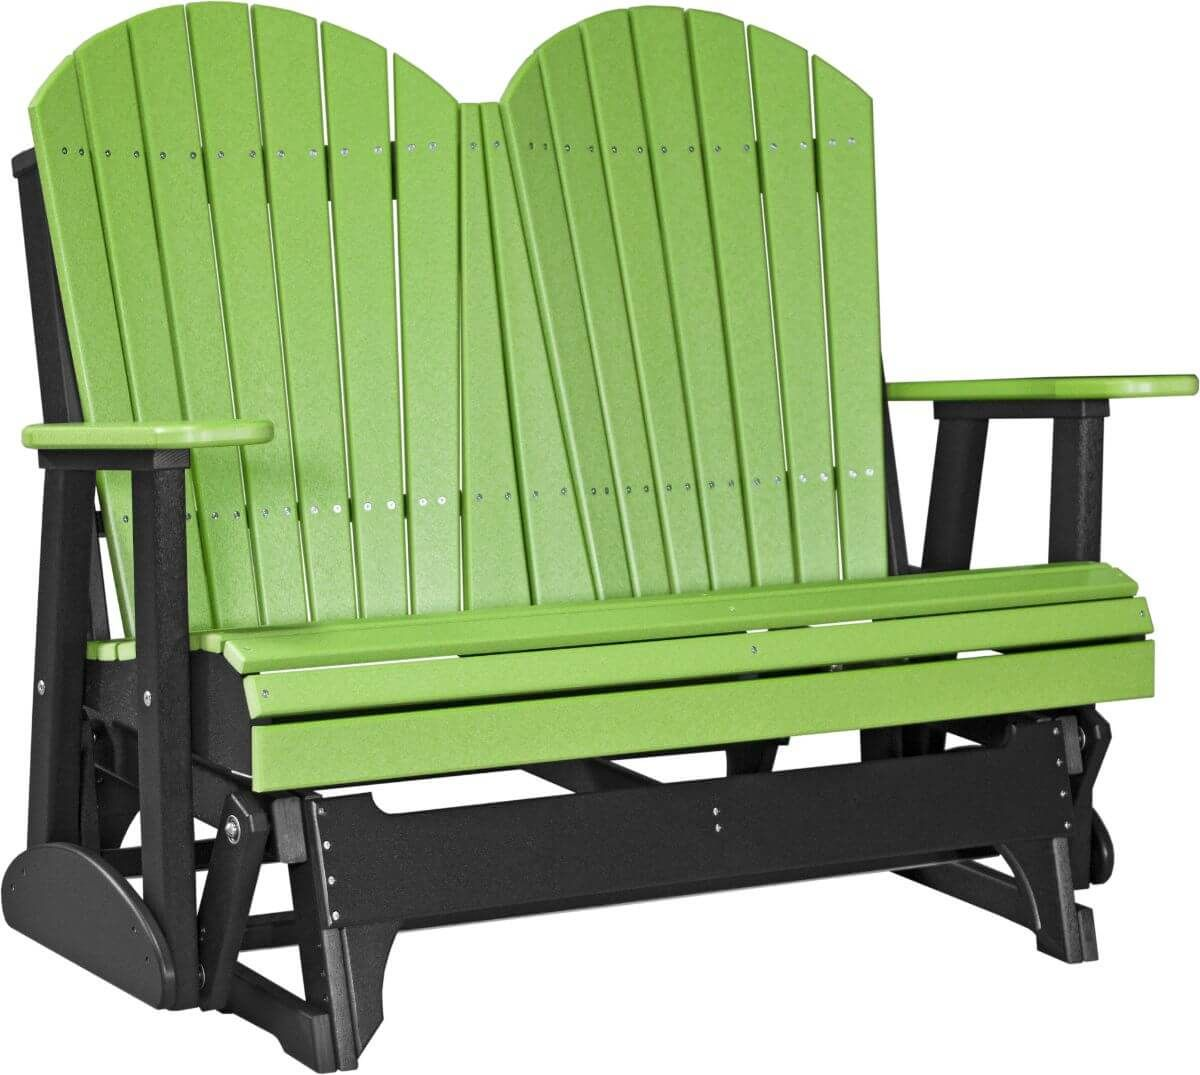 Lime Green and Black Tahiti Loveseat Patio Glider